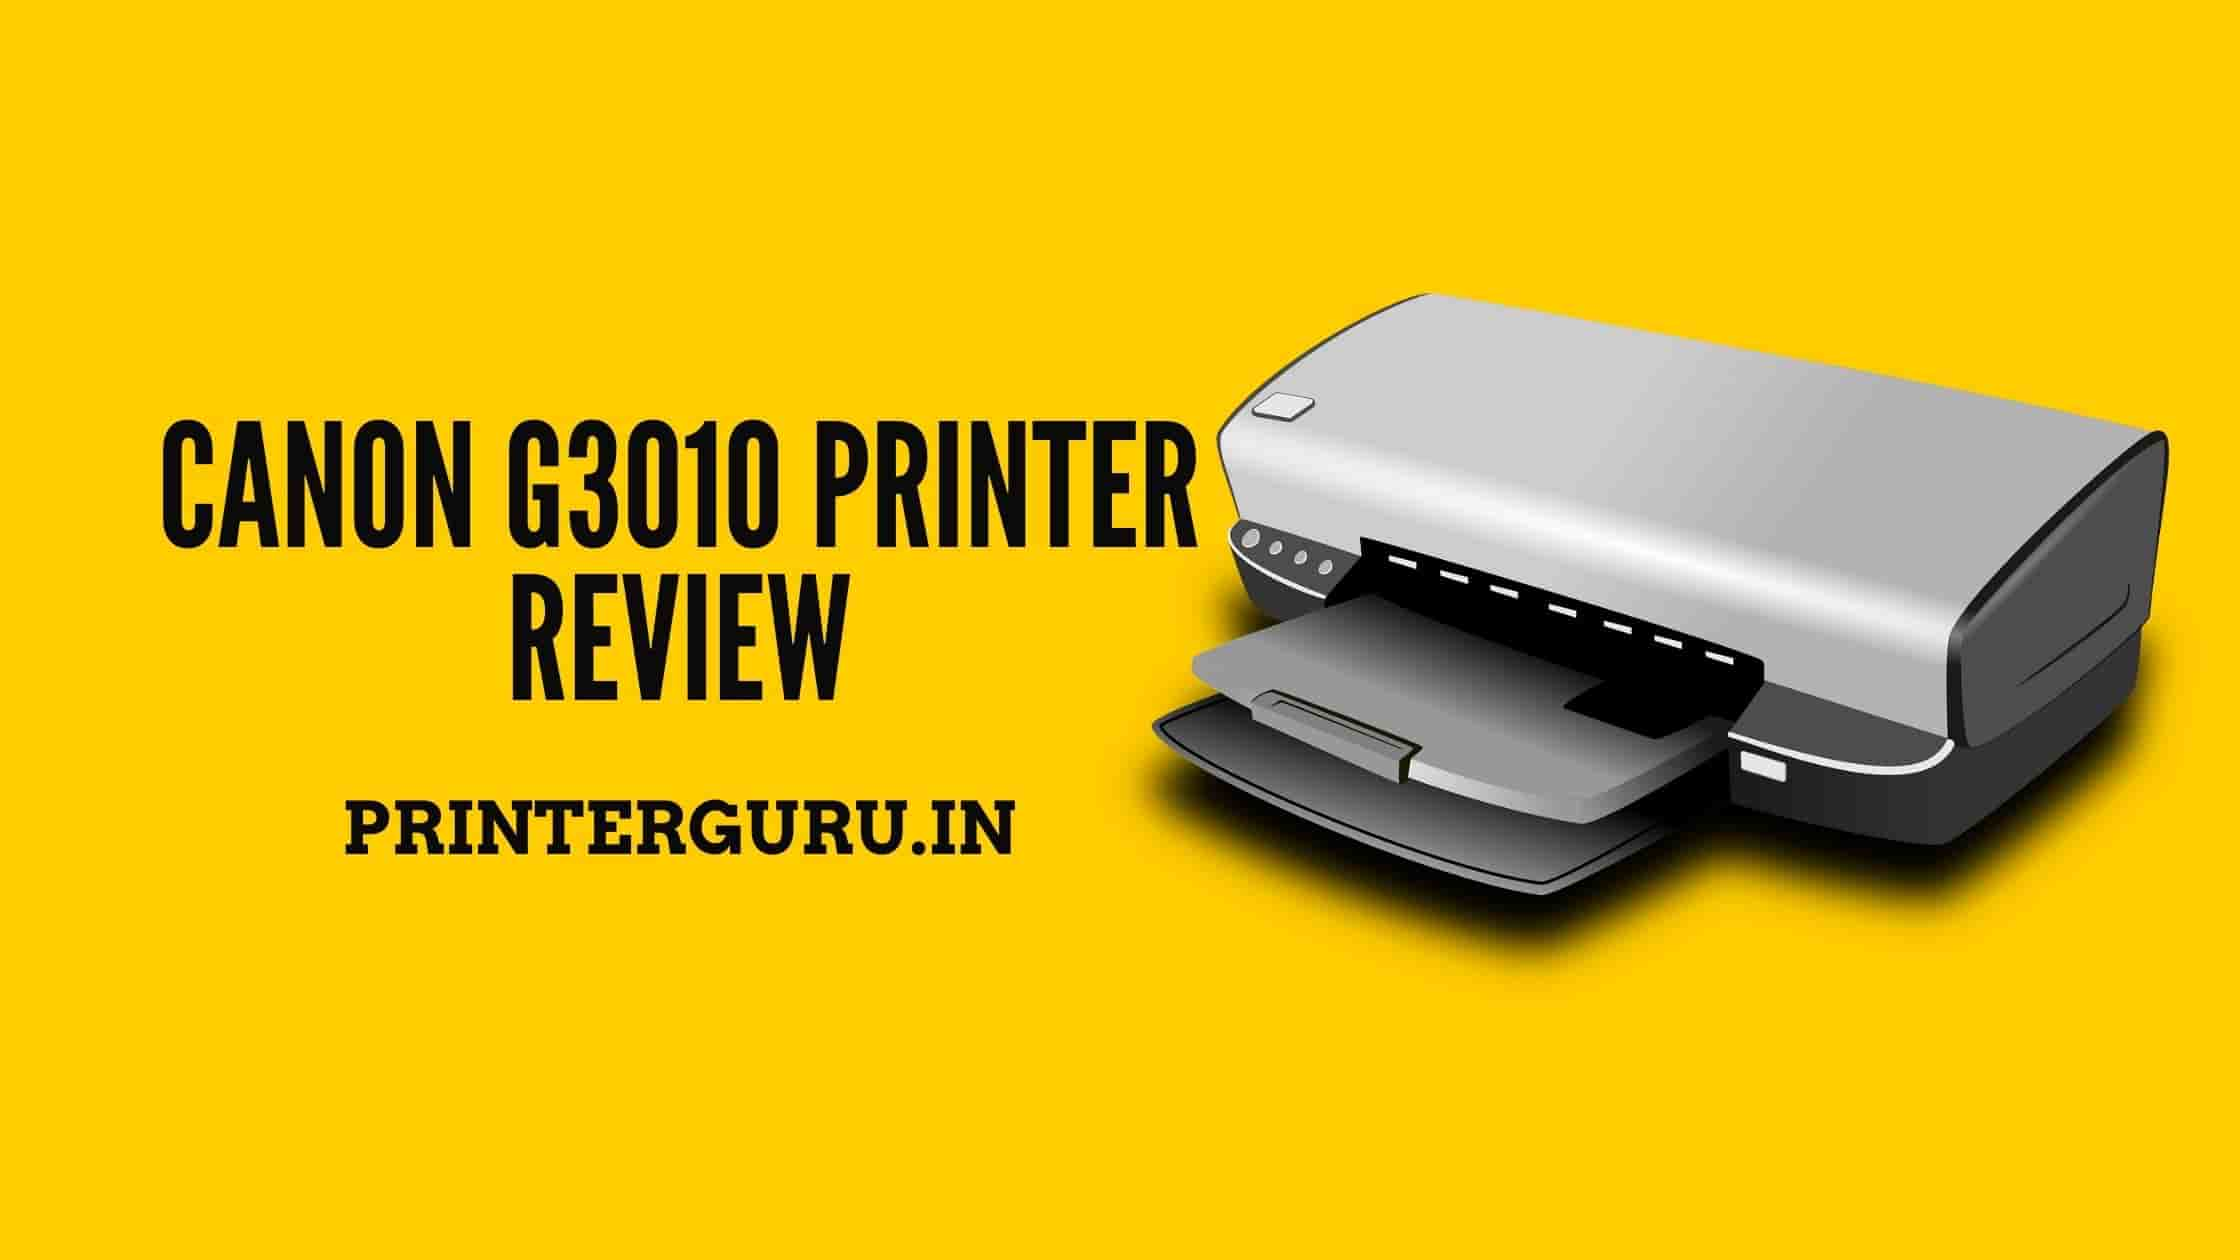 Canon G3010 Printer Review